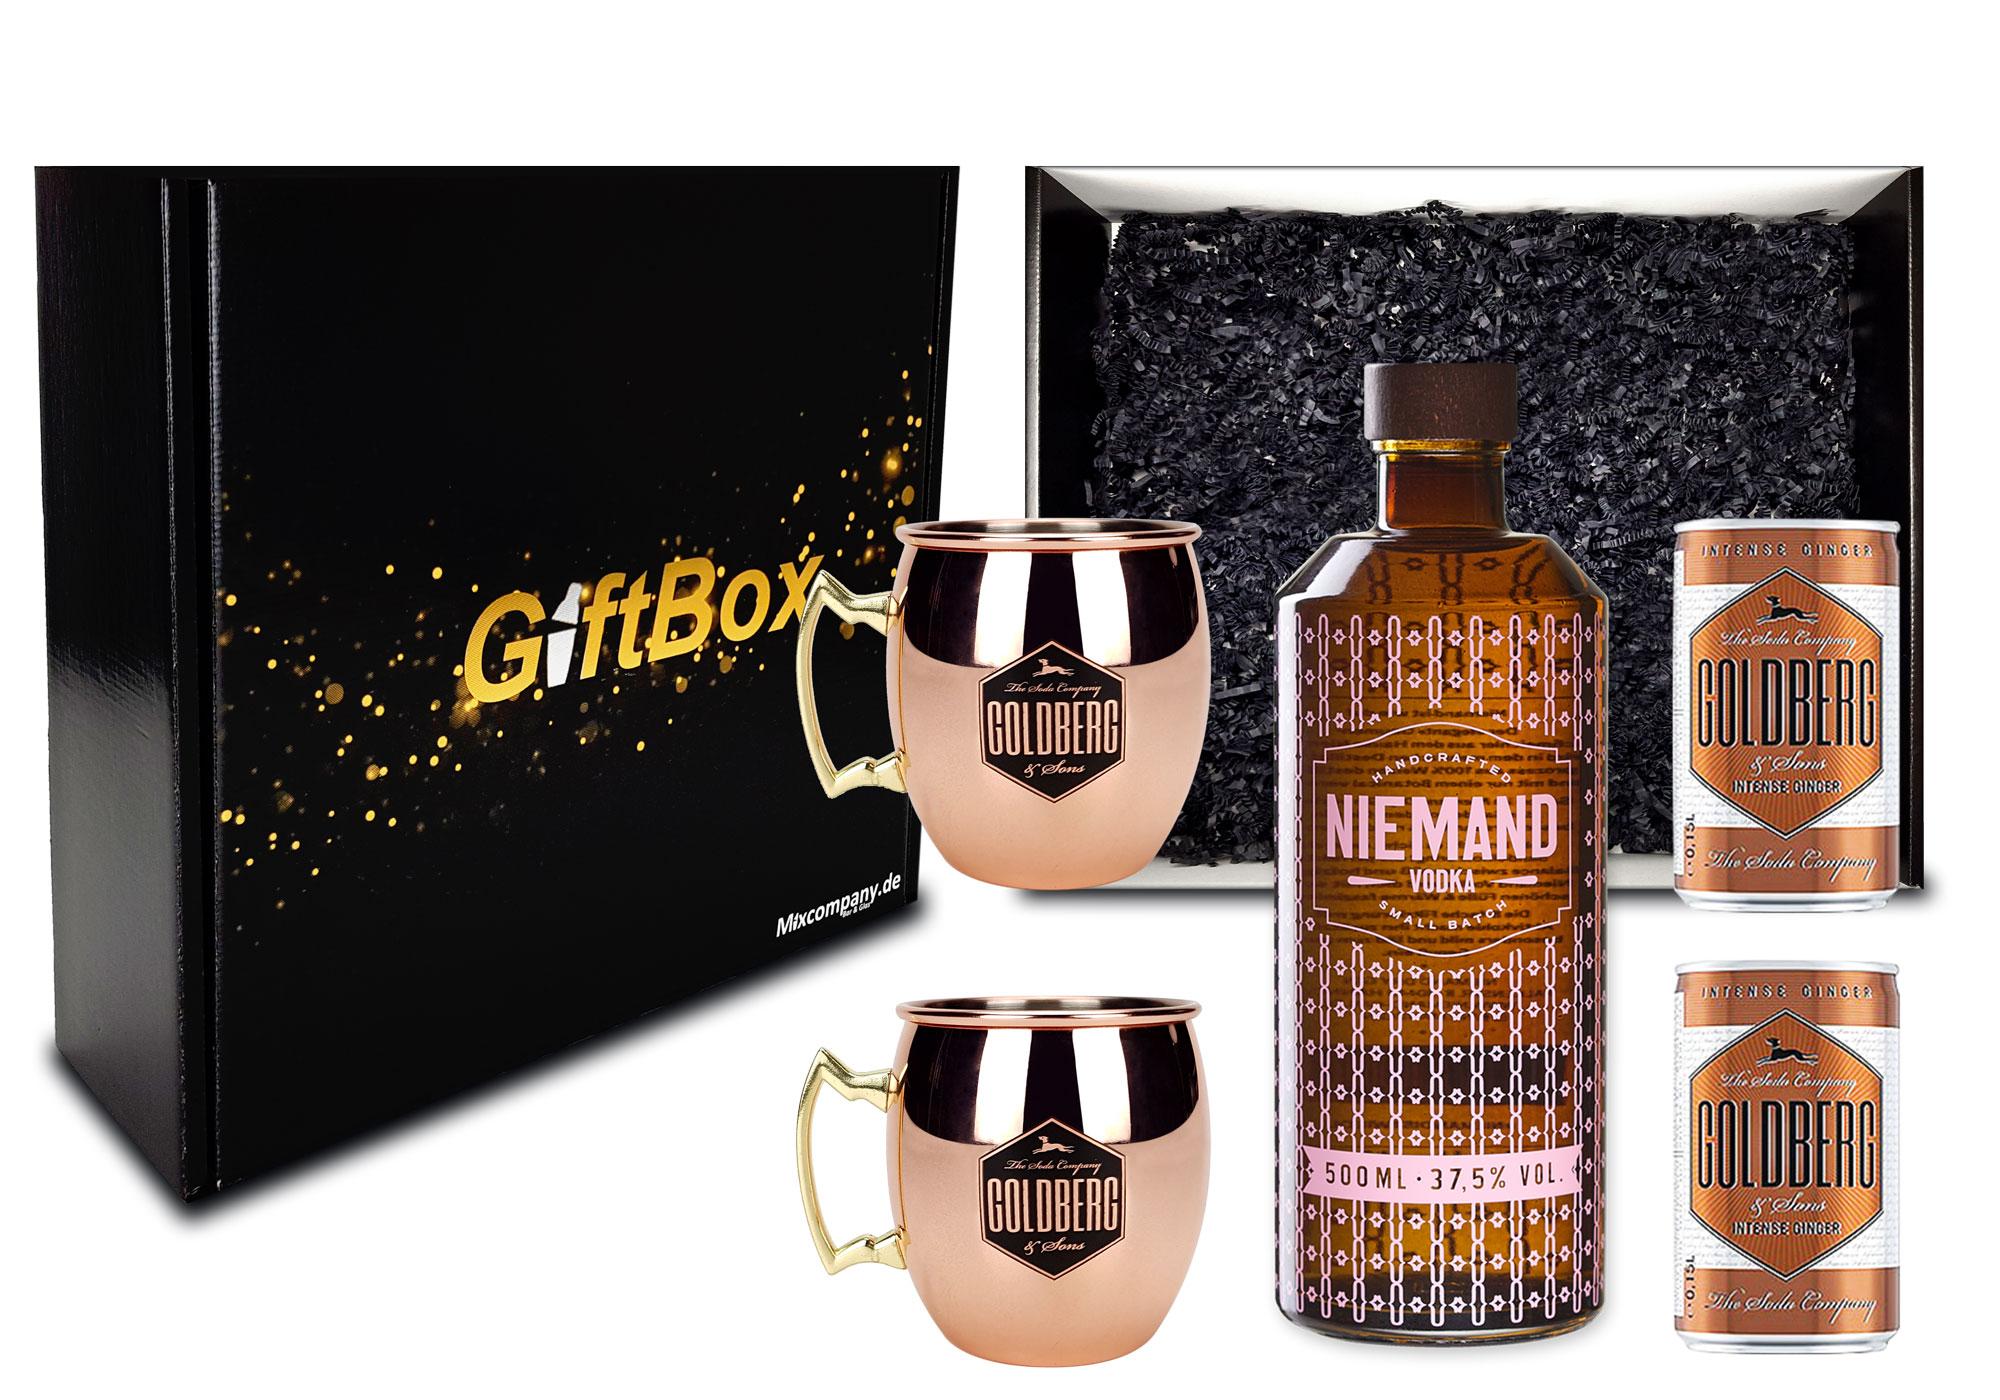 Moscow Mule Set Giftbox Geschenk Box Geschenkset Niemand Vodka Small Batch Handcrafted Wodka 0,5l 500ml (37,5% Vol) + 2x Goldberg Intense Ginger 0,15l inkl. Pfand EINWEG + 2x Mule Becher- [Enthält Sulfite]